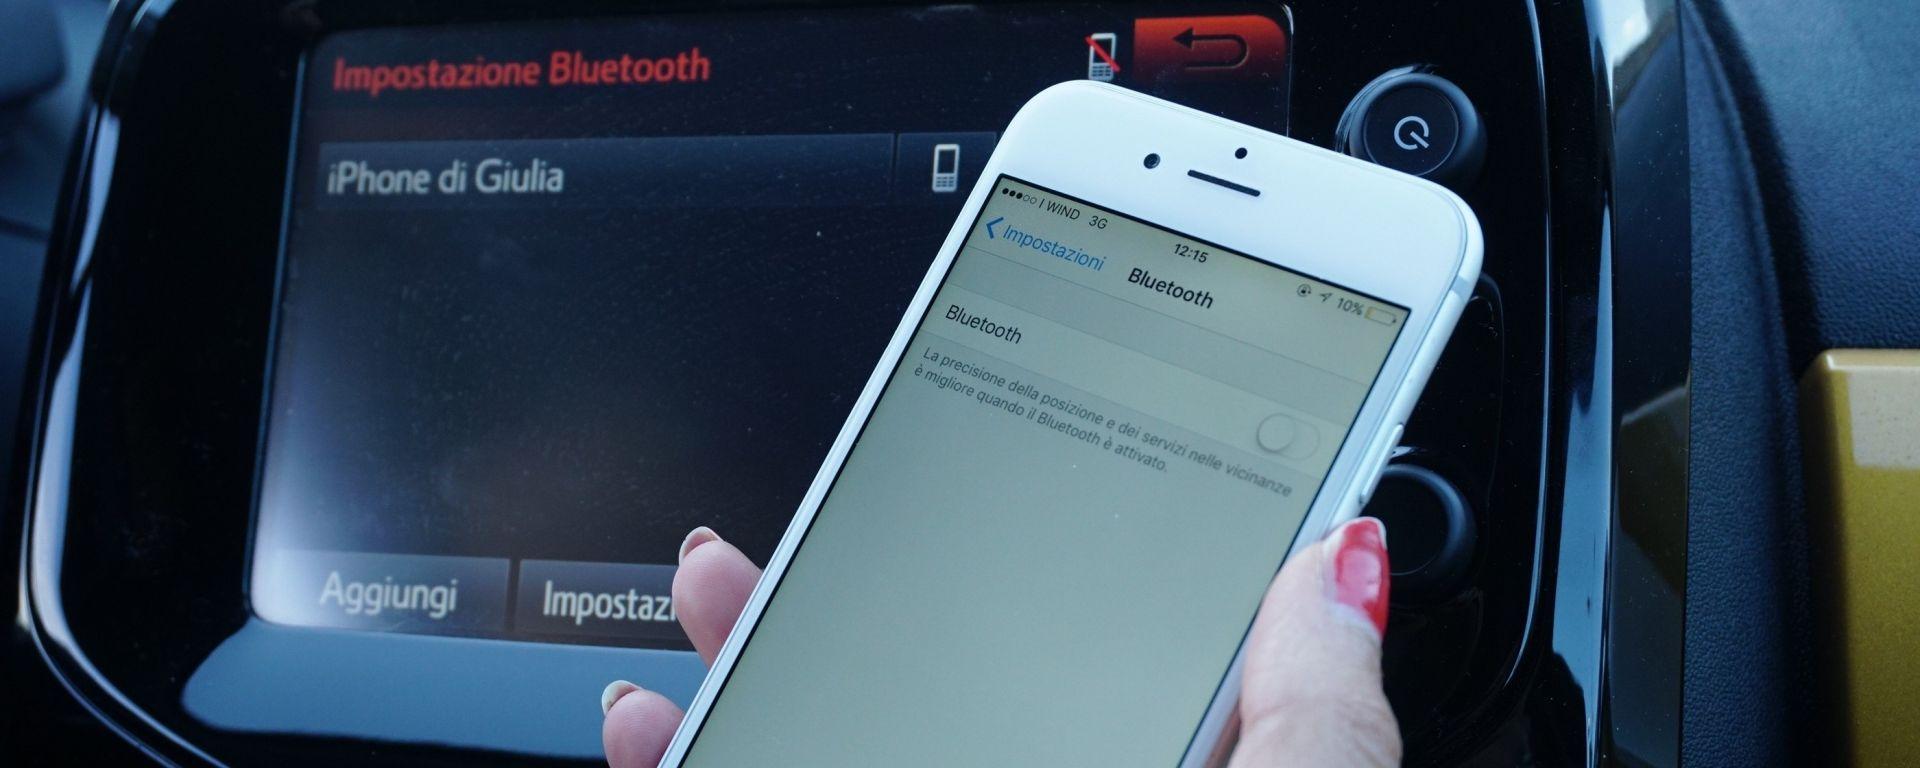 Peugeot 108: connessione via Bluetooth